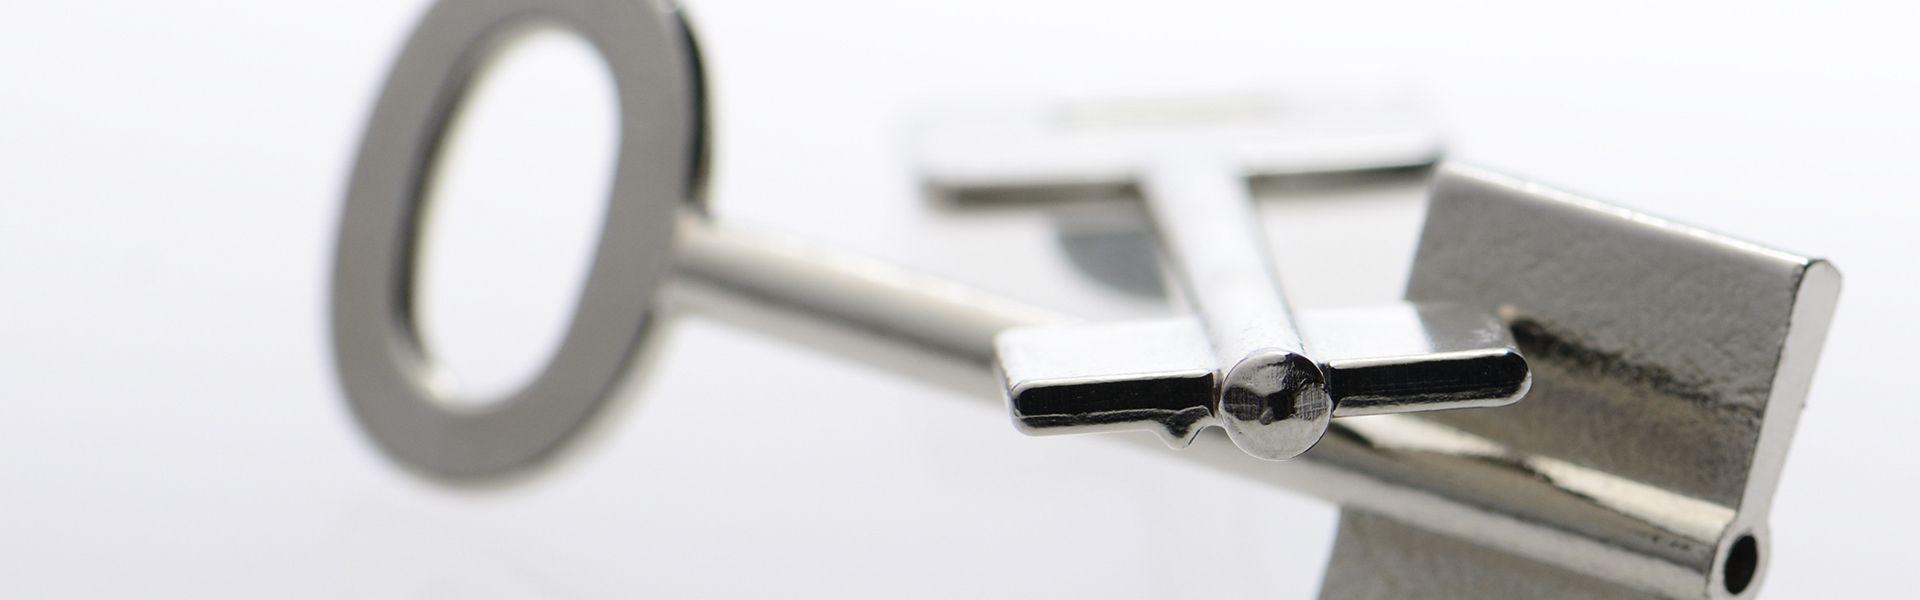 Bit Keys and Pump Keys